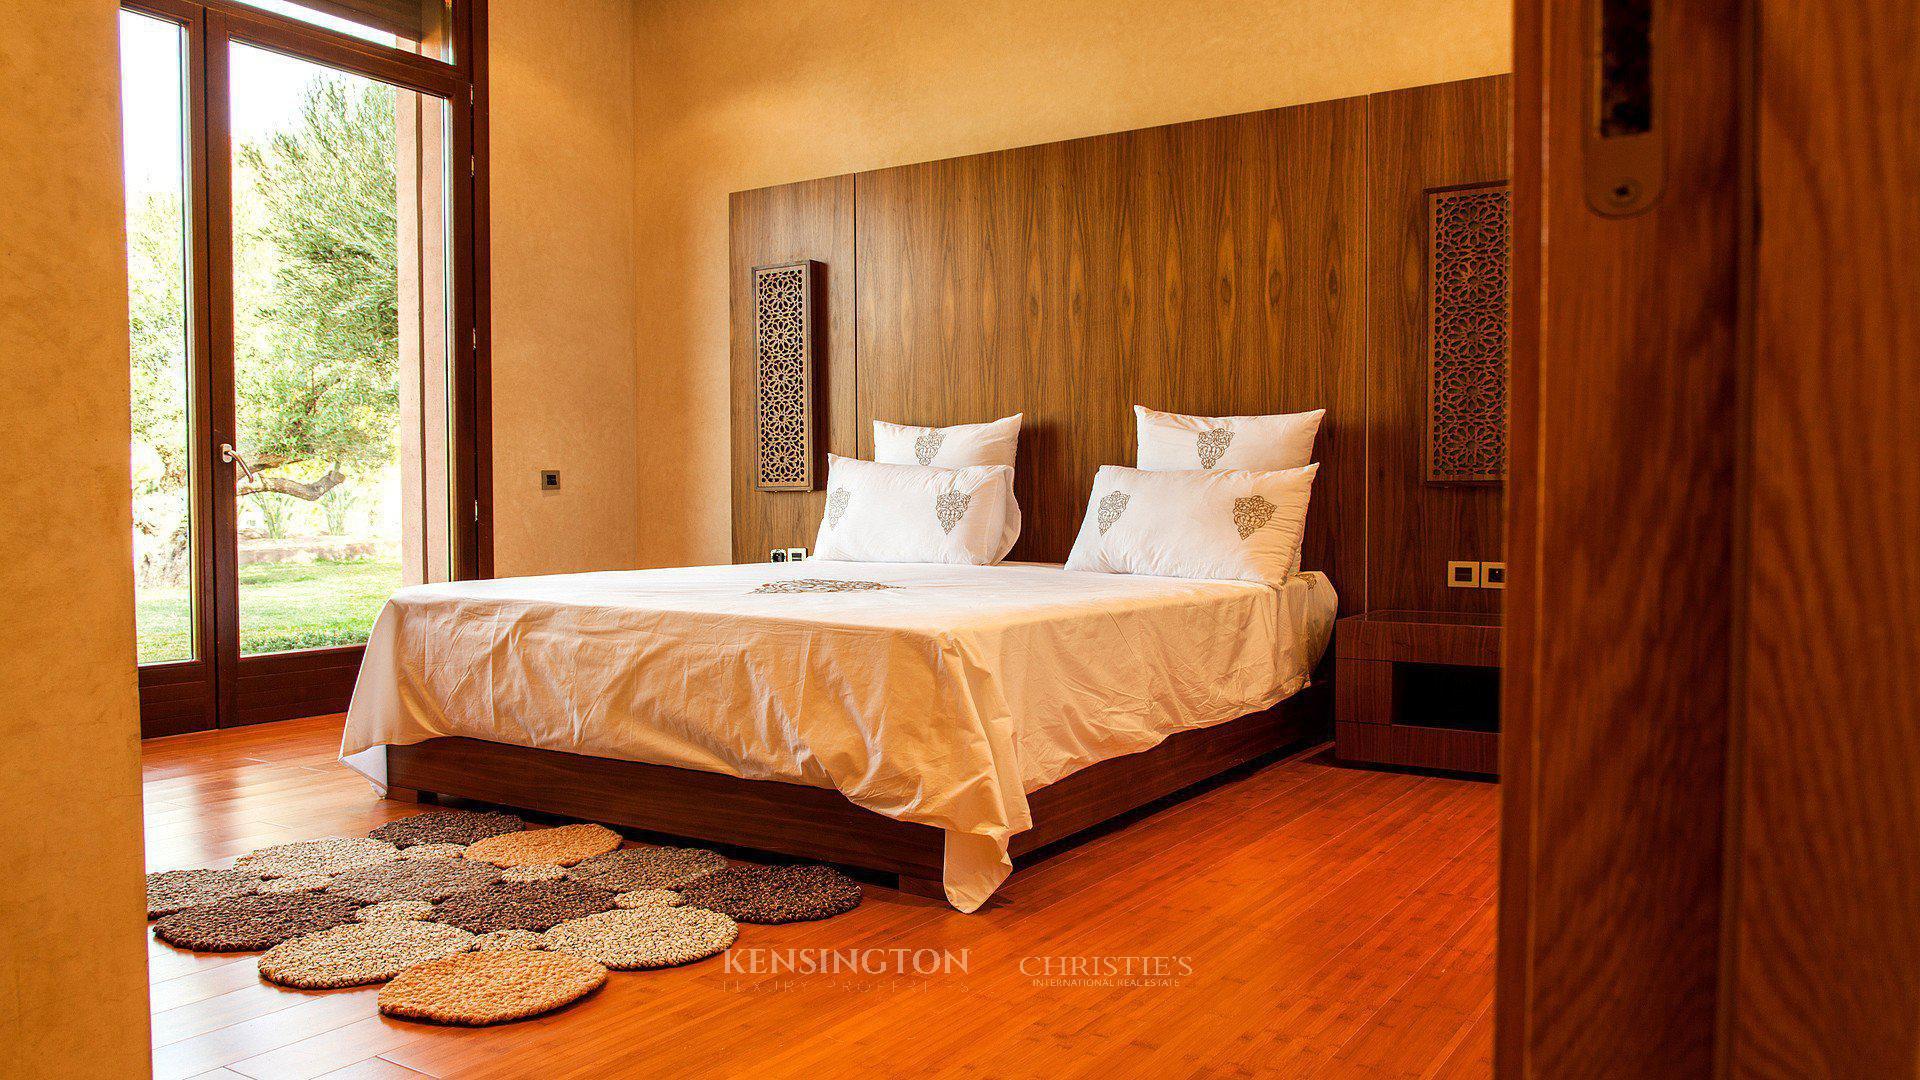 KPPM00529: Villa Nashira Luxury Villa Marrakech Morocco